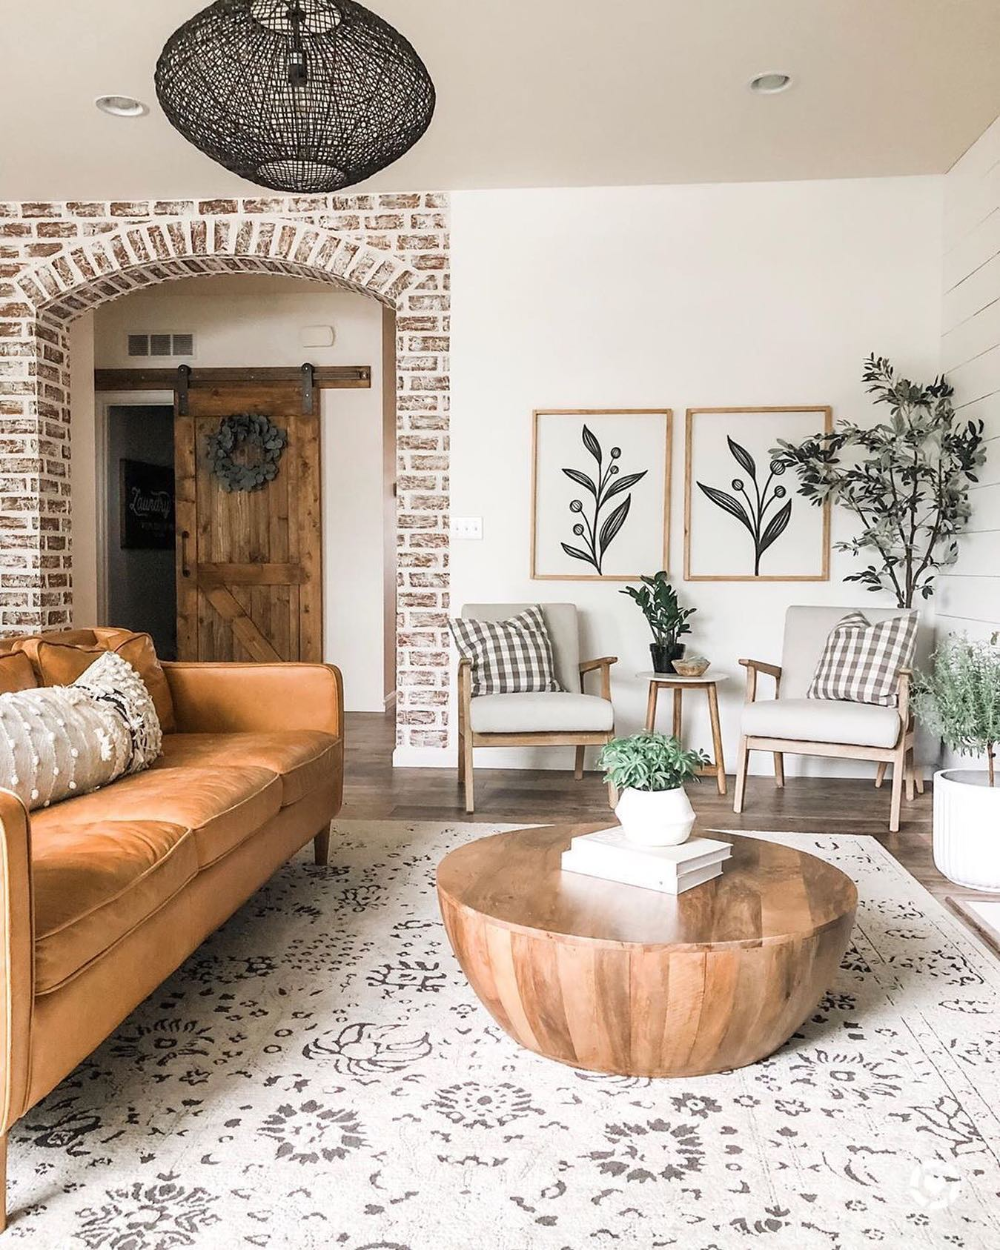 43++ Area rug in living room ideas ideas in 2021